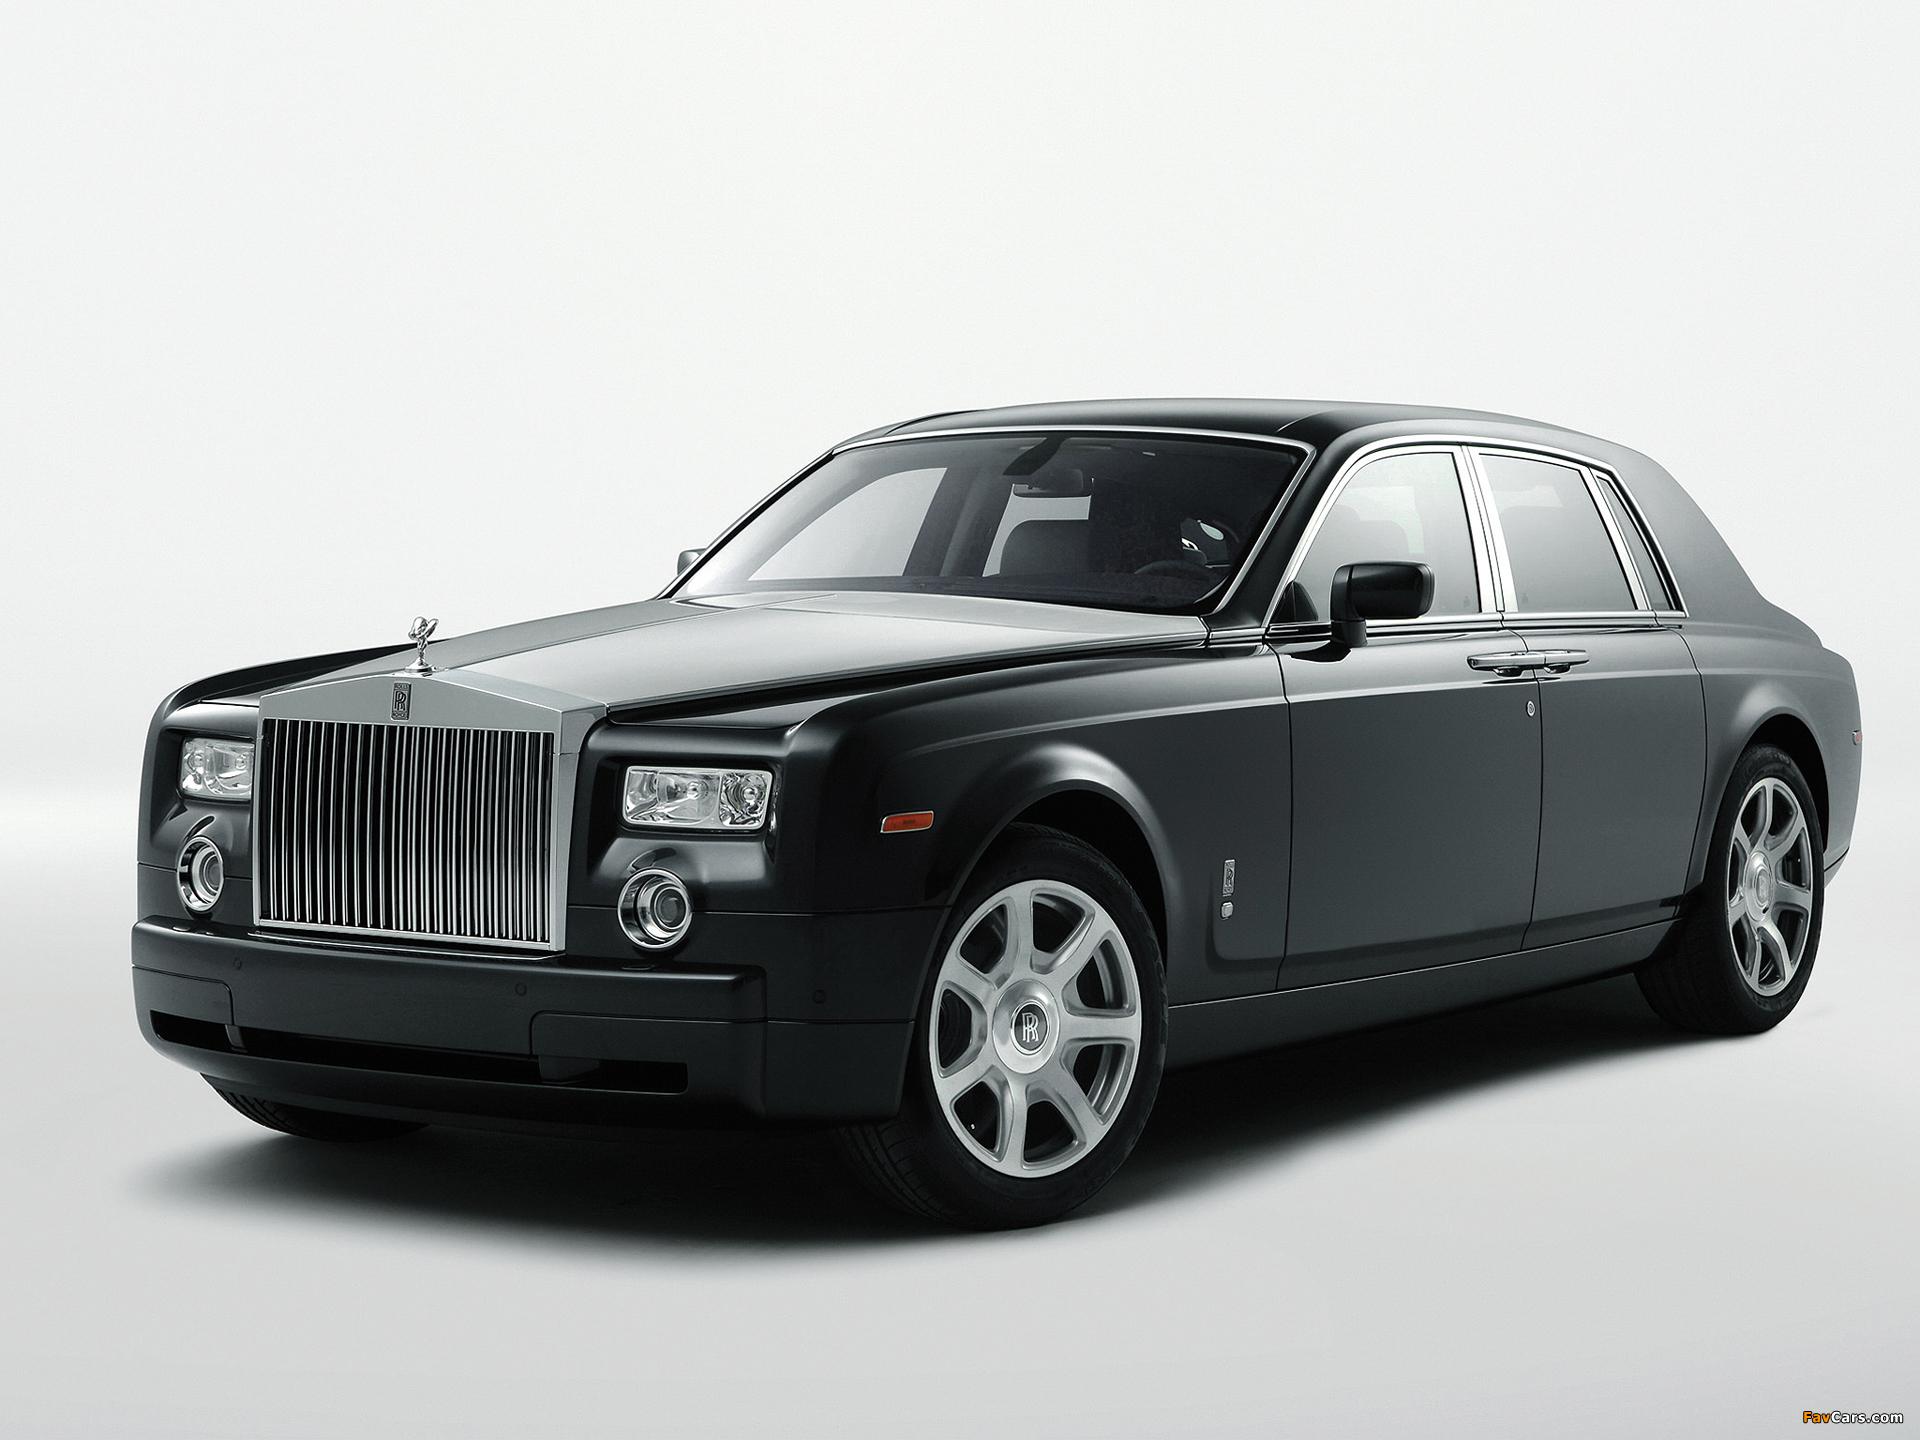 Images of Rolls-Royce Phantom Tungsten 2007 (1920 x 1440)